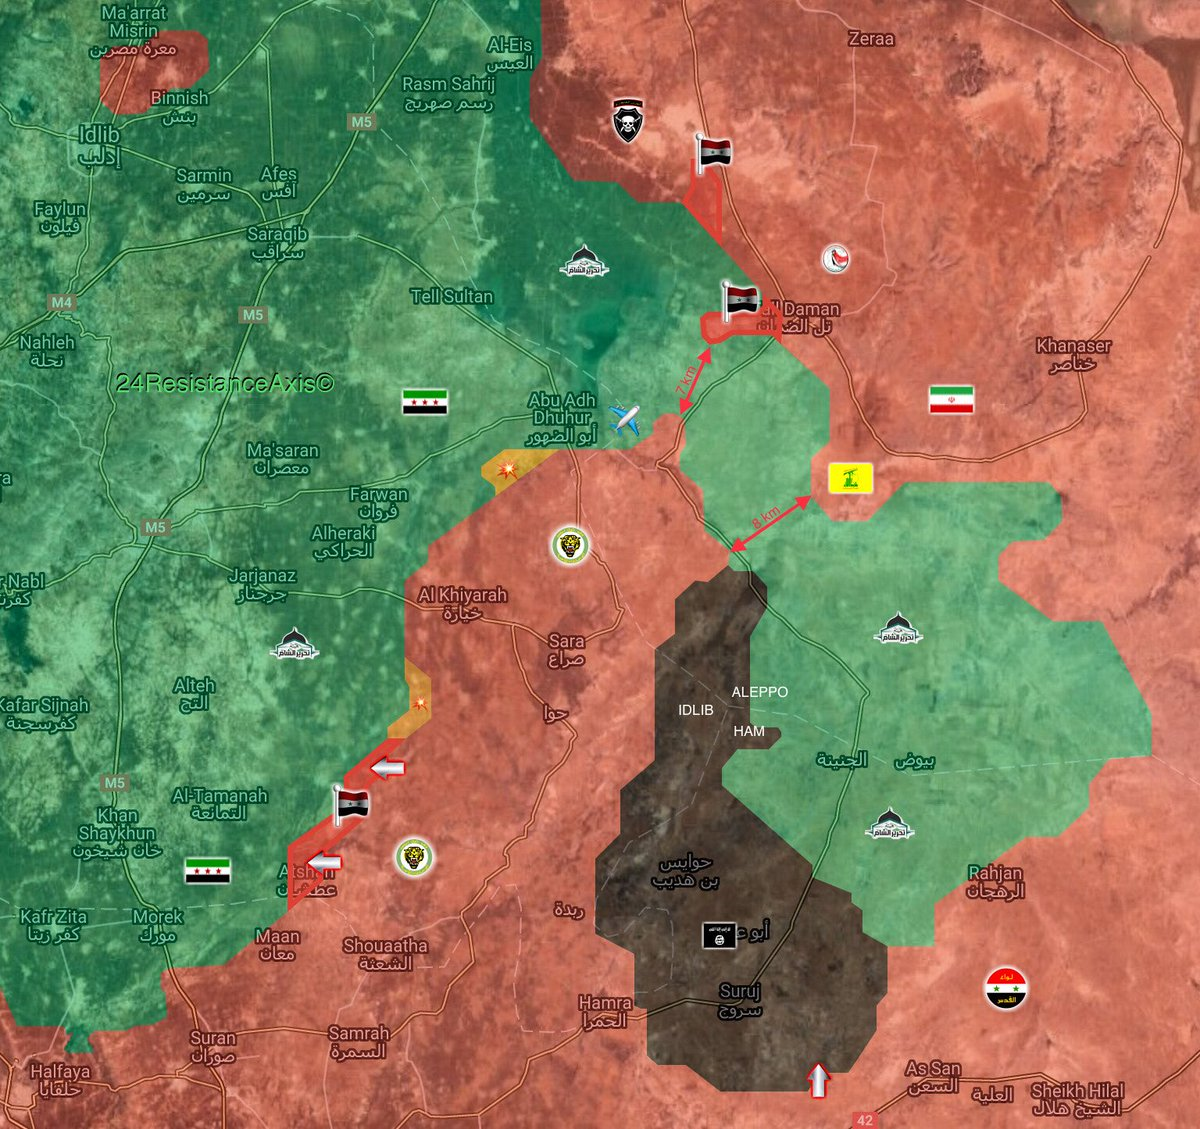 Government Forces Recapture 8 Villages From Militants In Abu al-Duhur Area (Map)